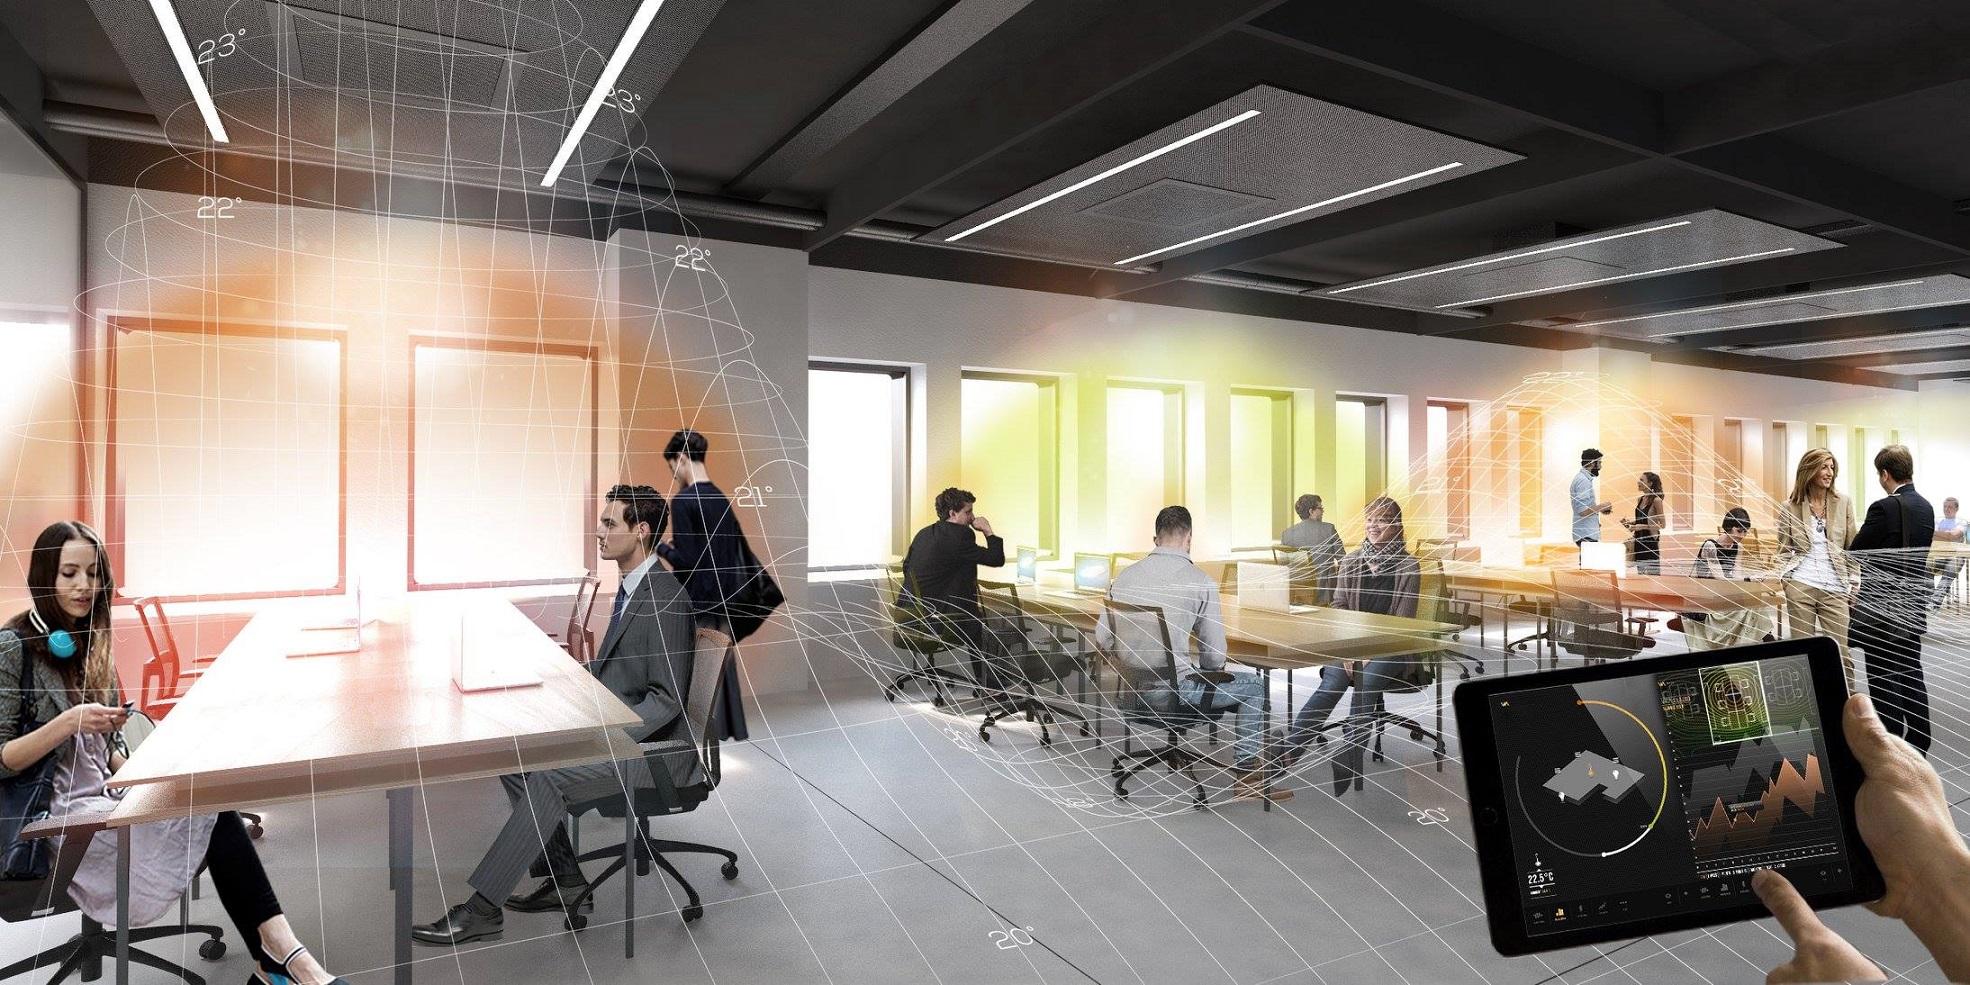 Office 3.0